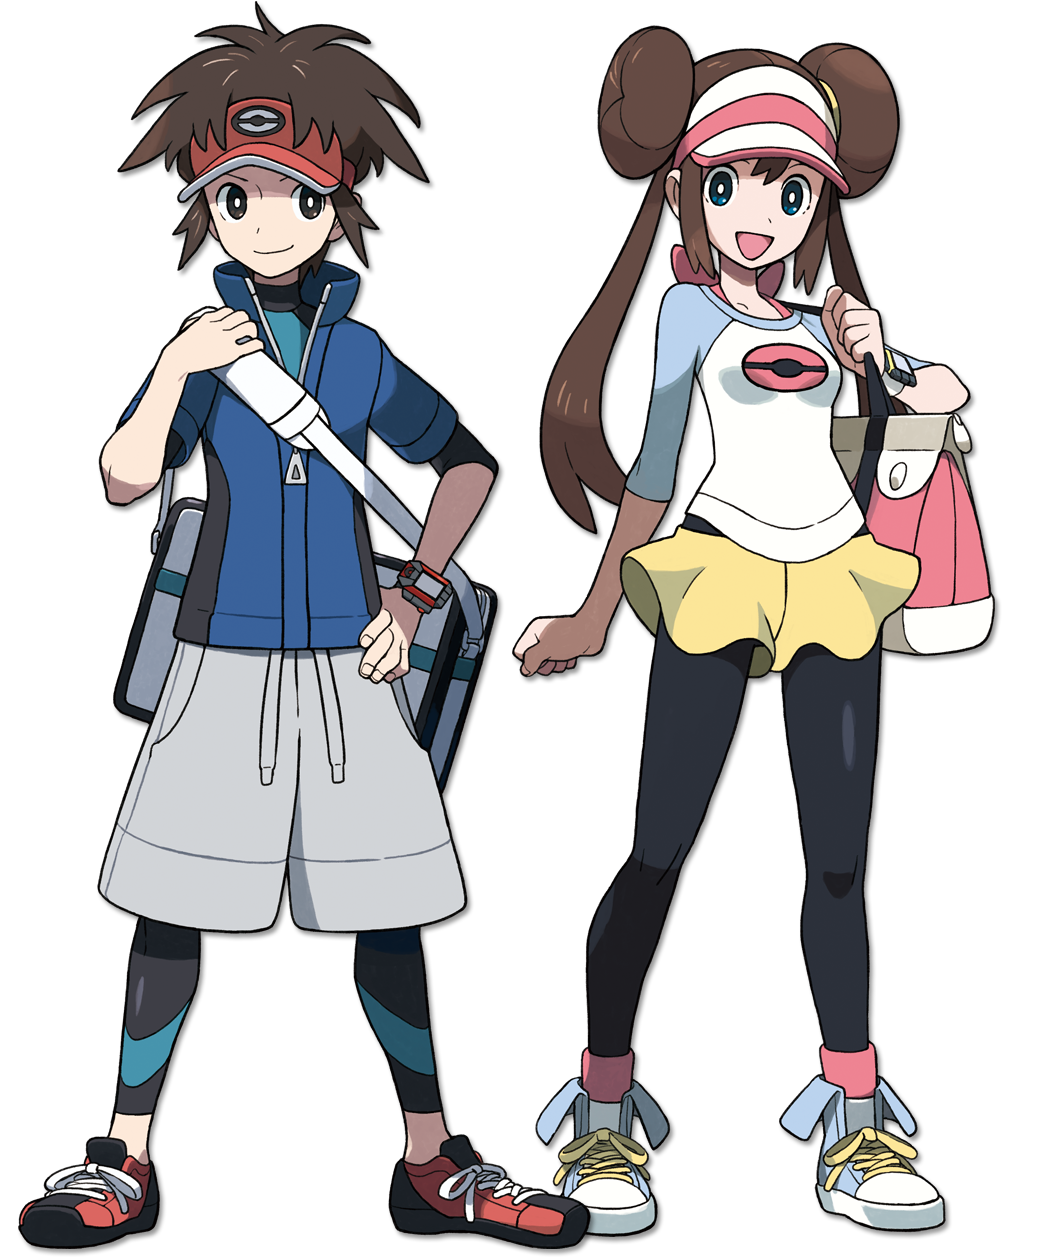 [Hilo Oficial] Pokemon Blanco/Negro 2 Personajes_de_B2_y_W2